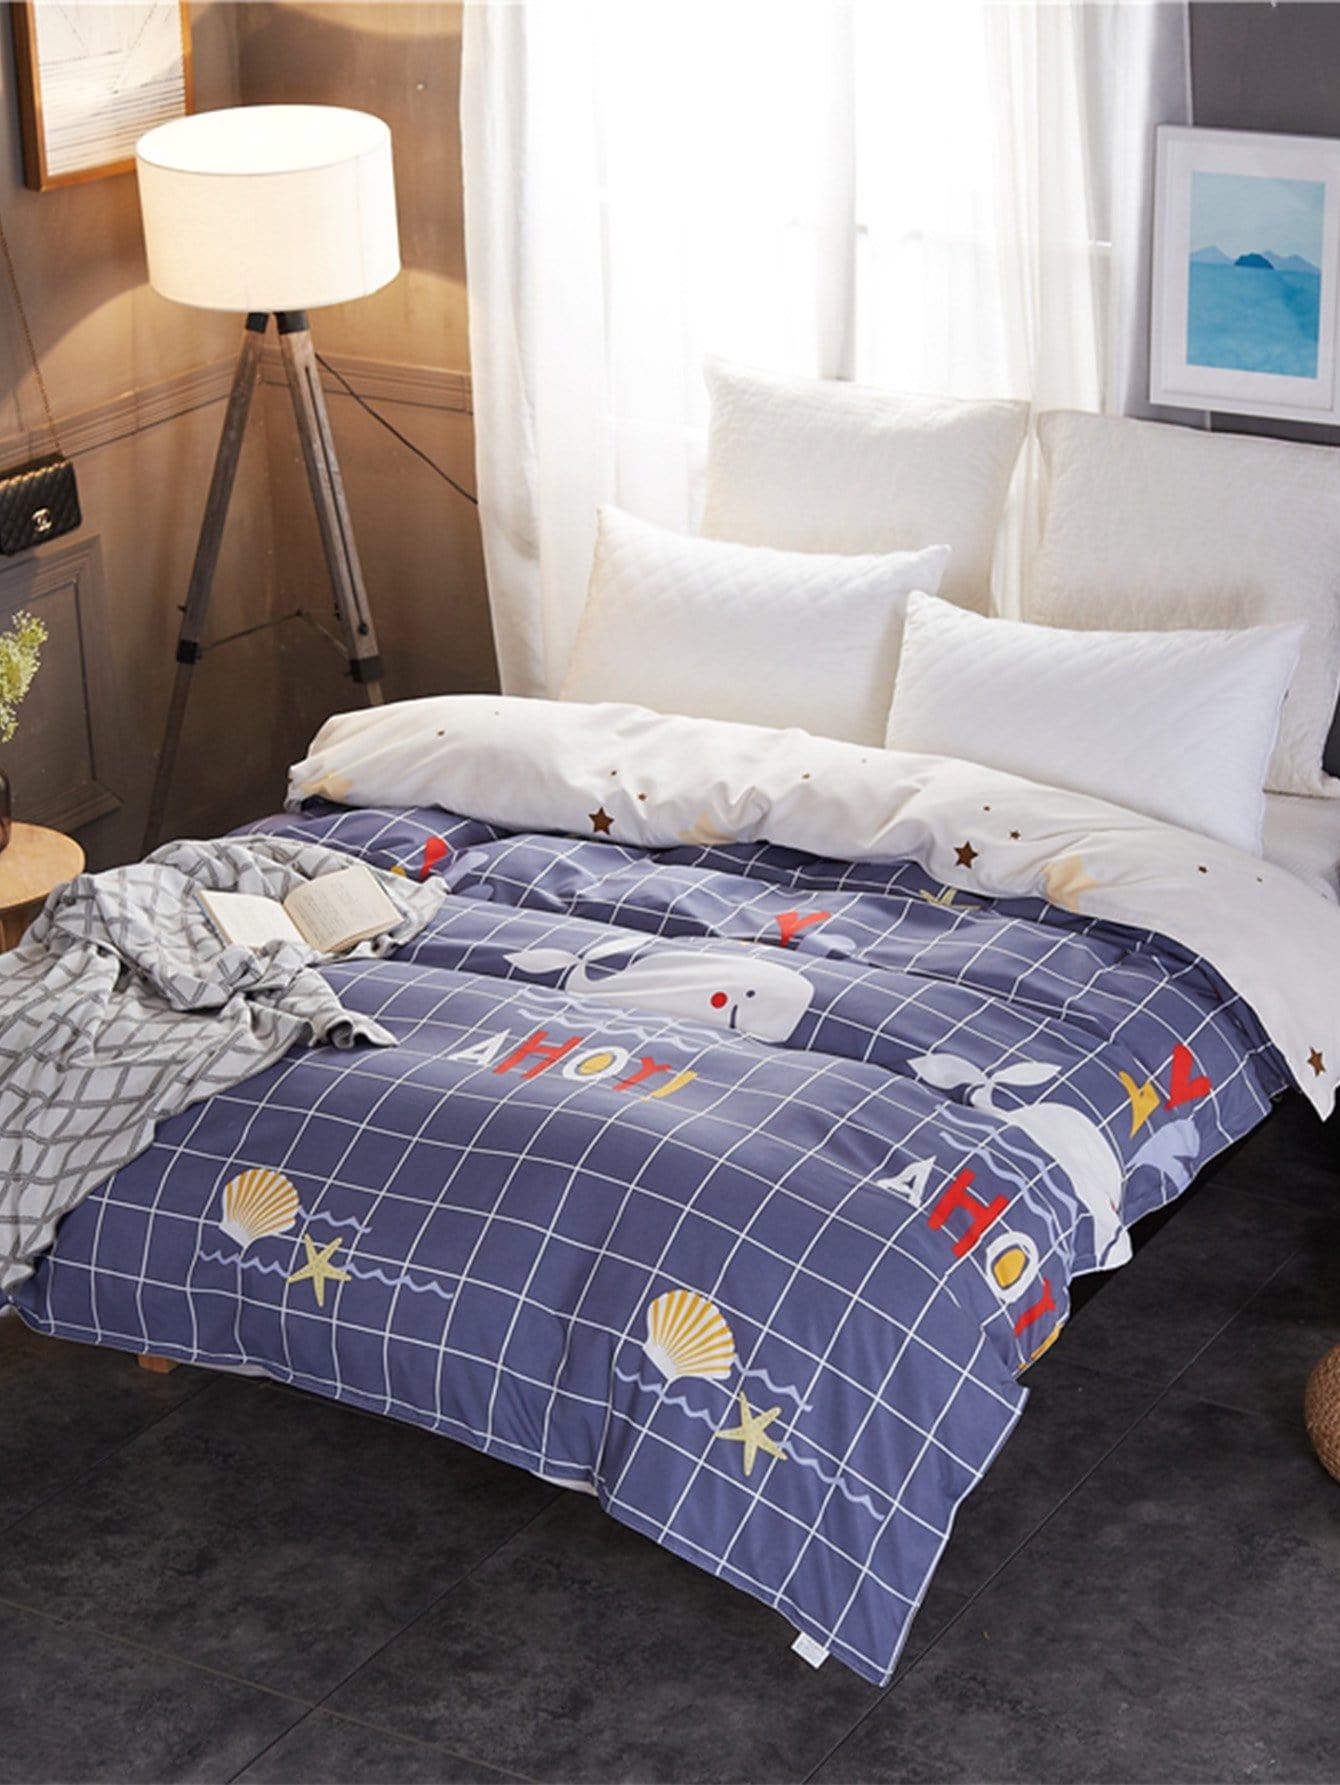 housse de couette imprim e oc an carreaux french shein sheinside. Black Bedroom Furniture Sets. Home Design Ideas